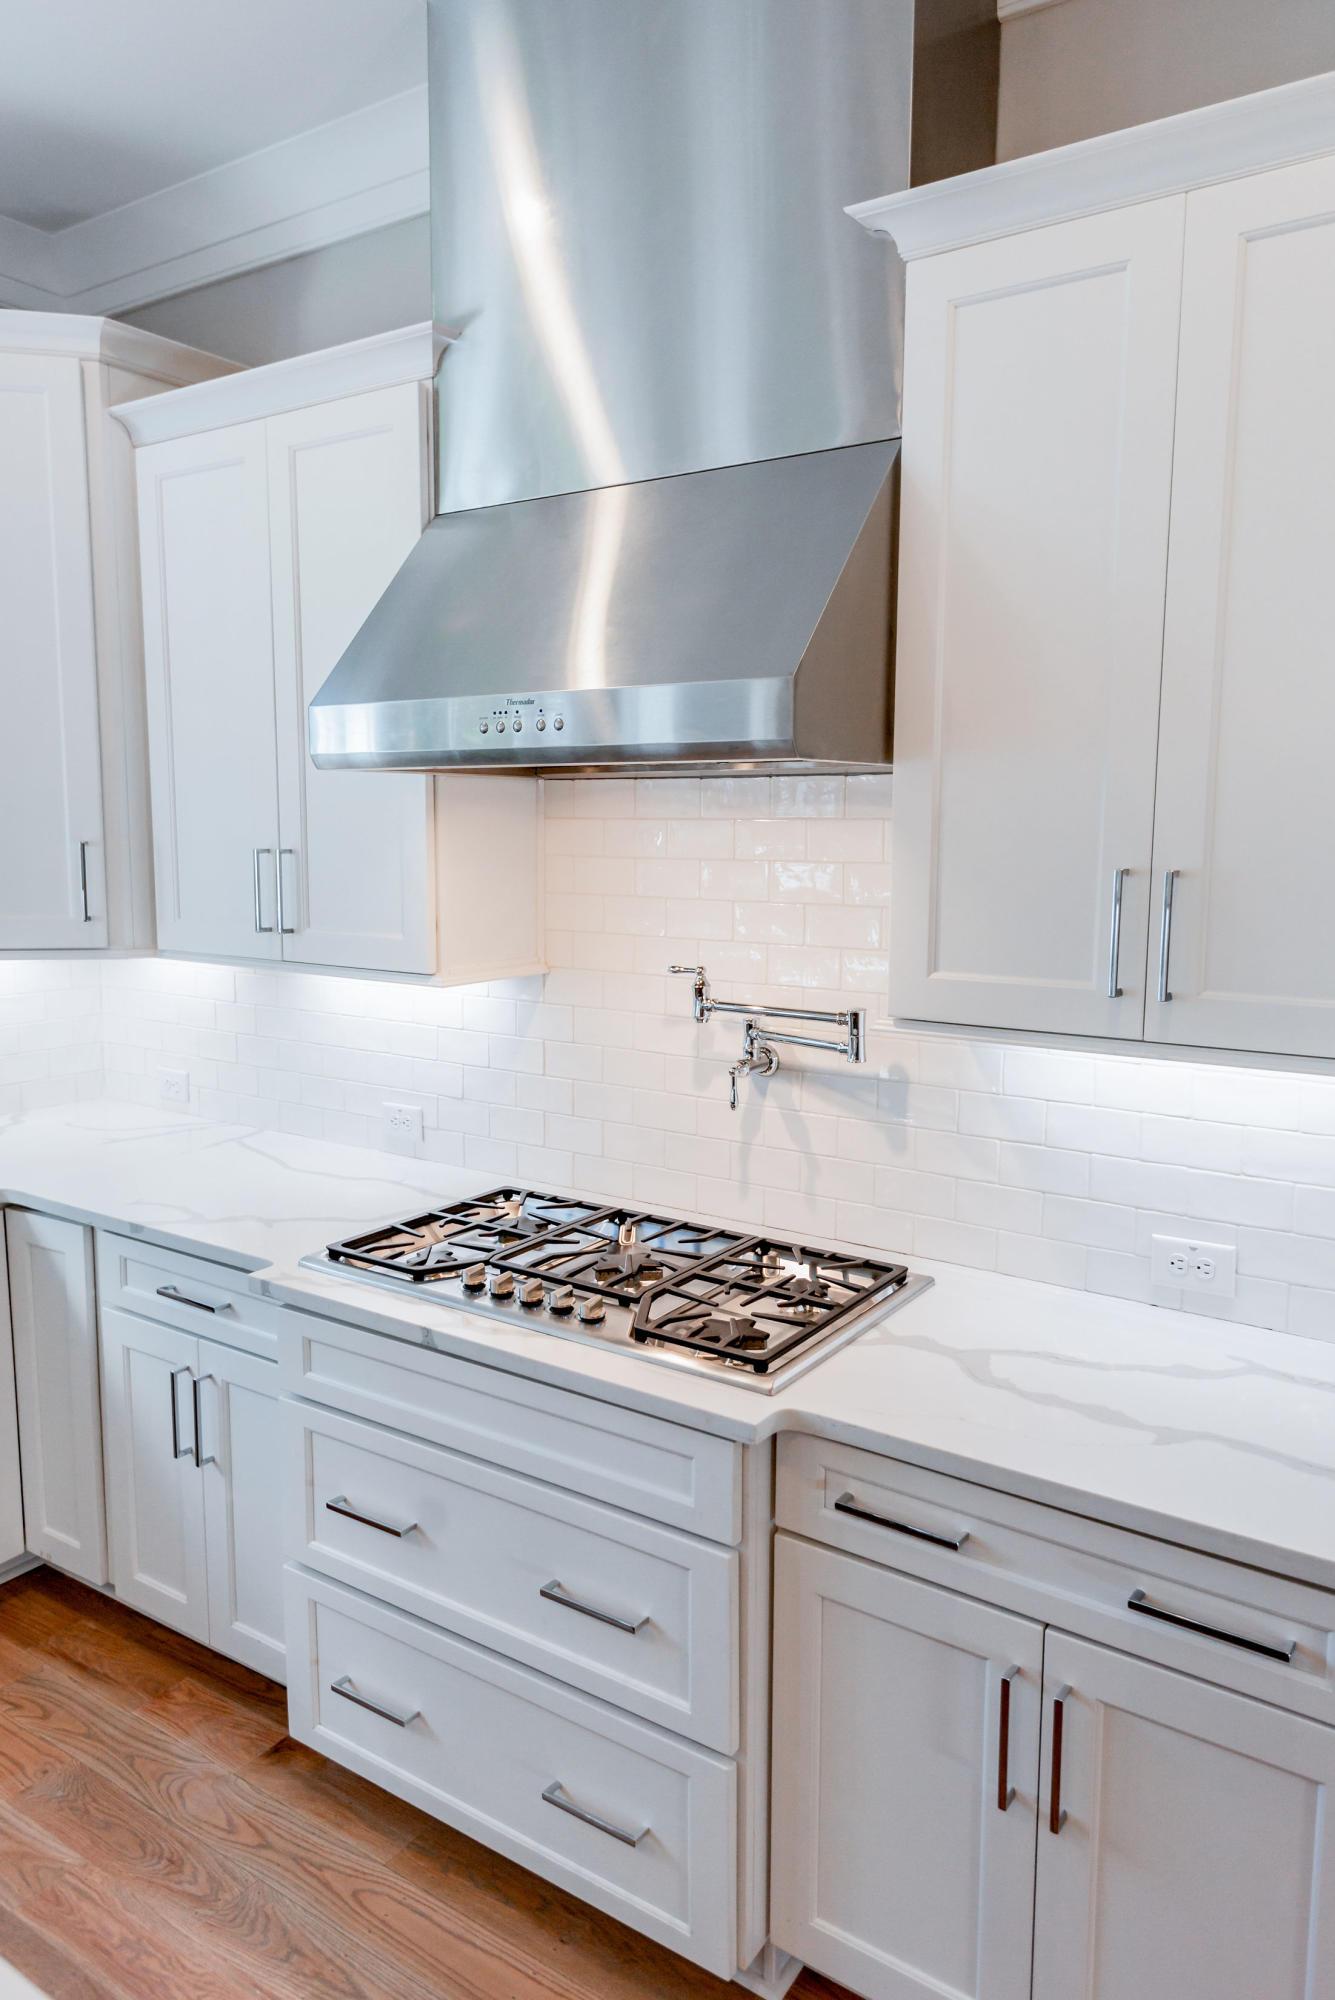 Park West Homes For Sale - 2295 Middlesex, Mount Pleasant, SC - 9